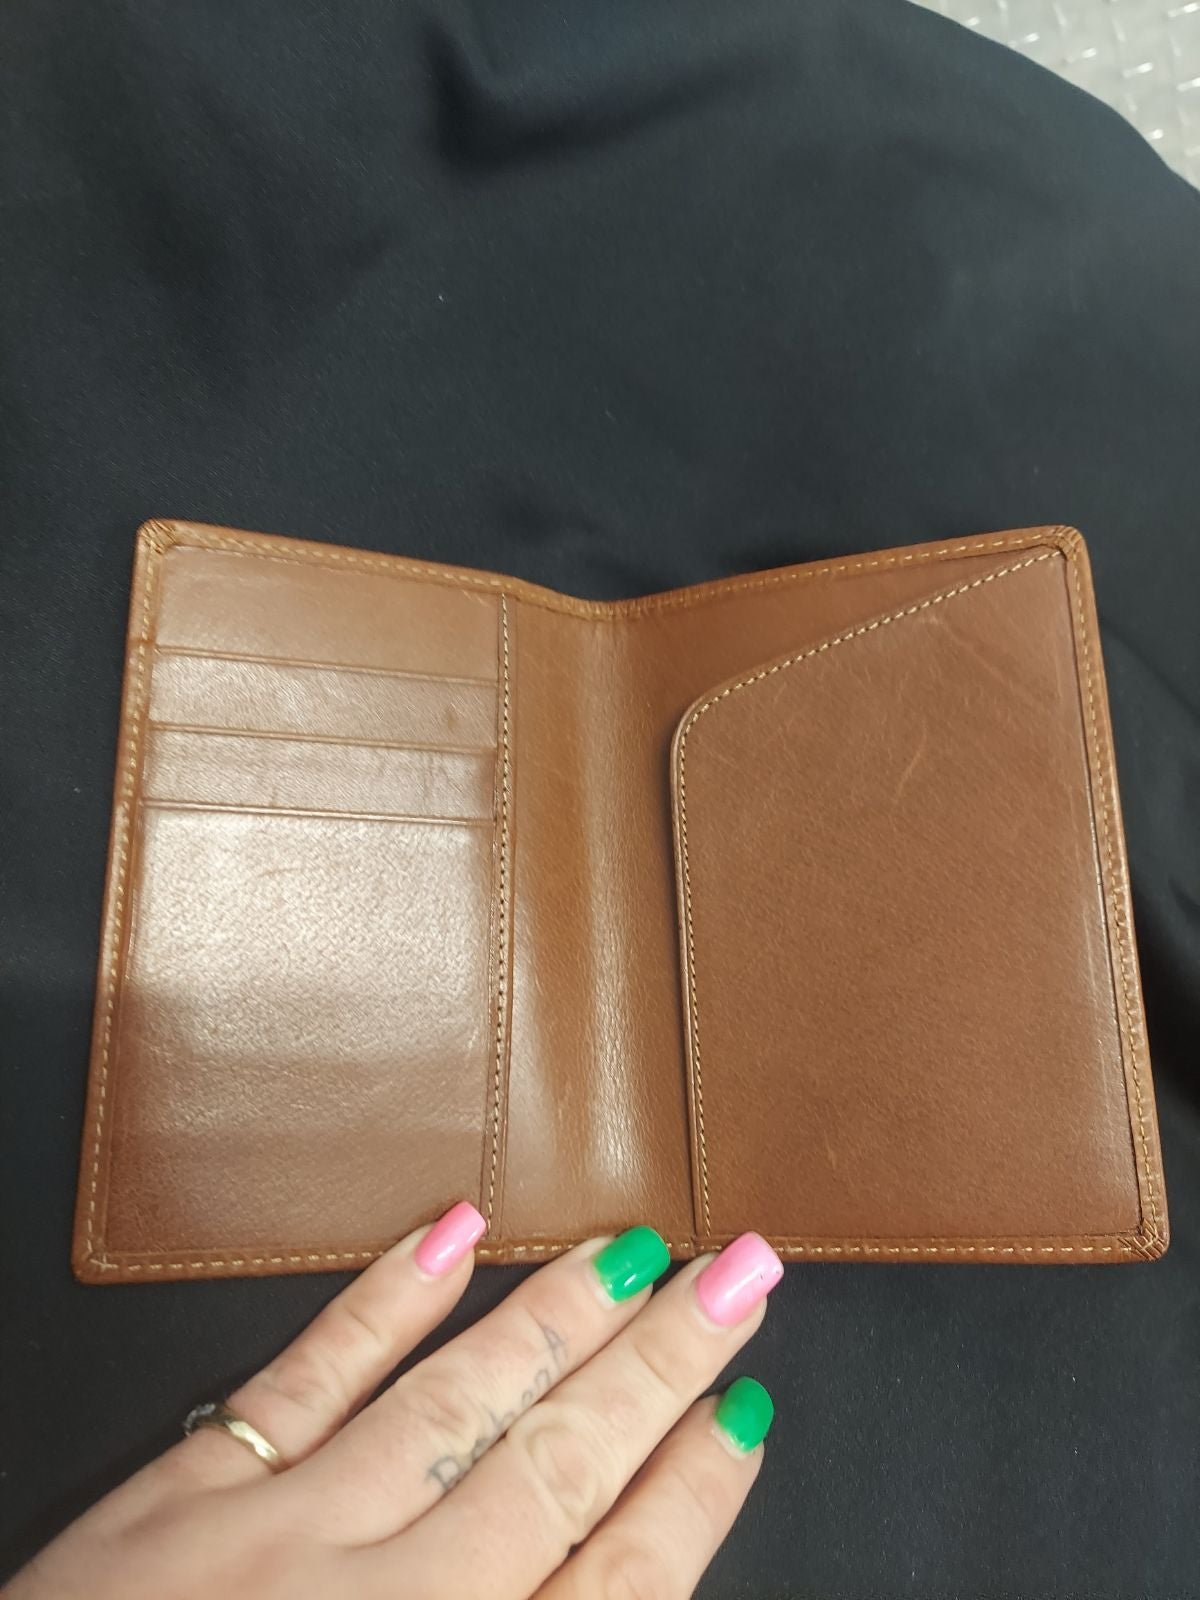 Coach Tan Leather Passport Holder RETAIL